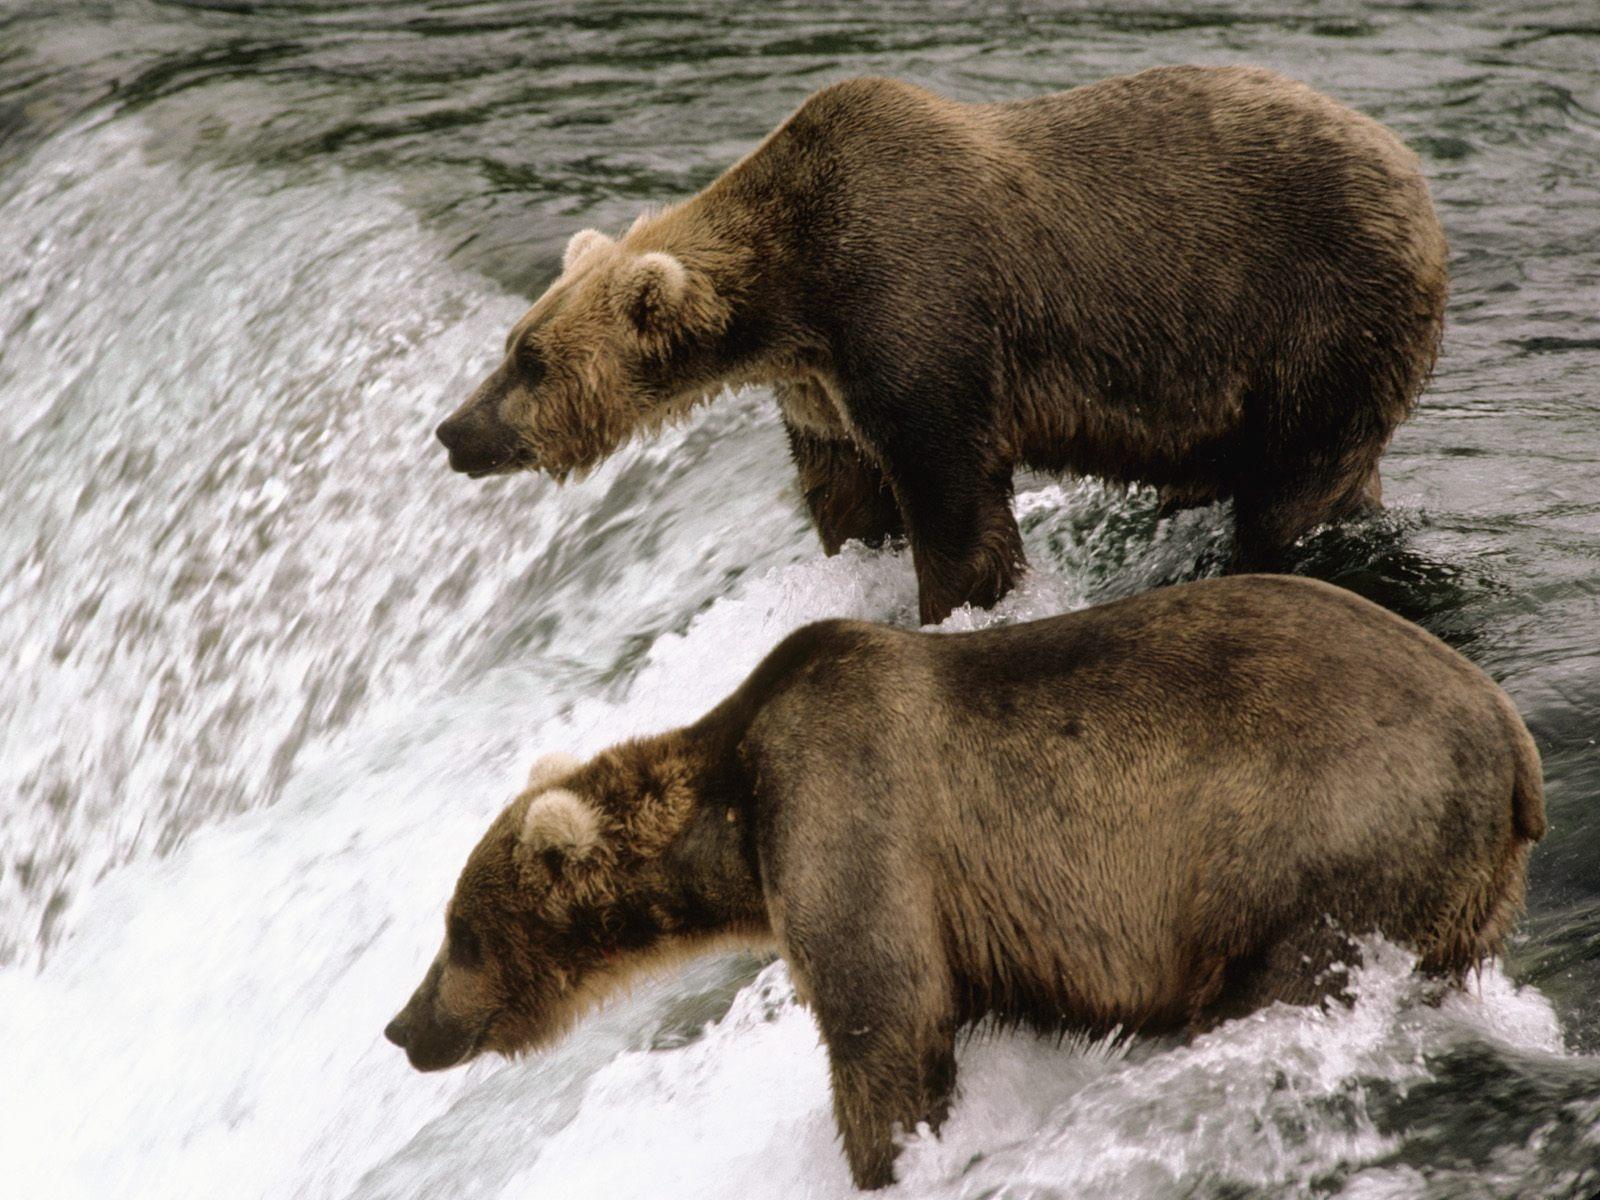 Wallpaper Of Bears